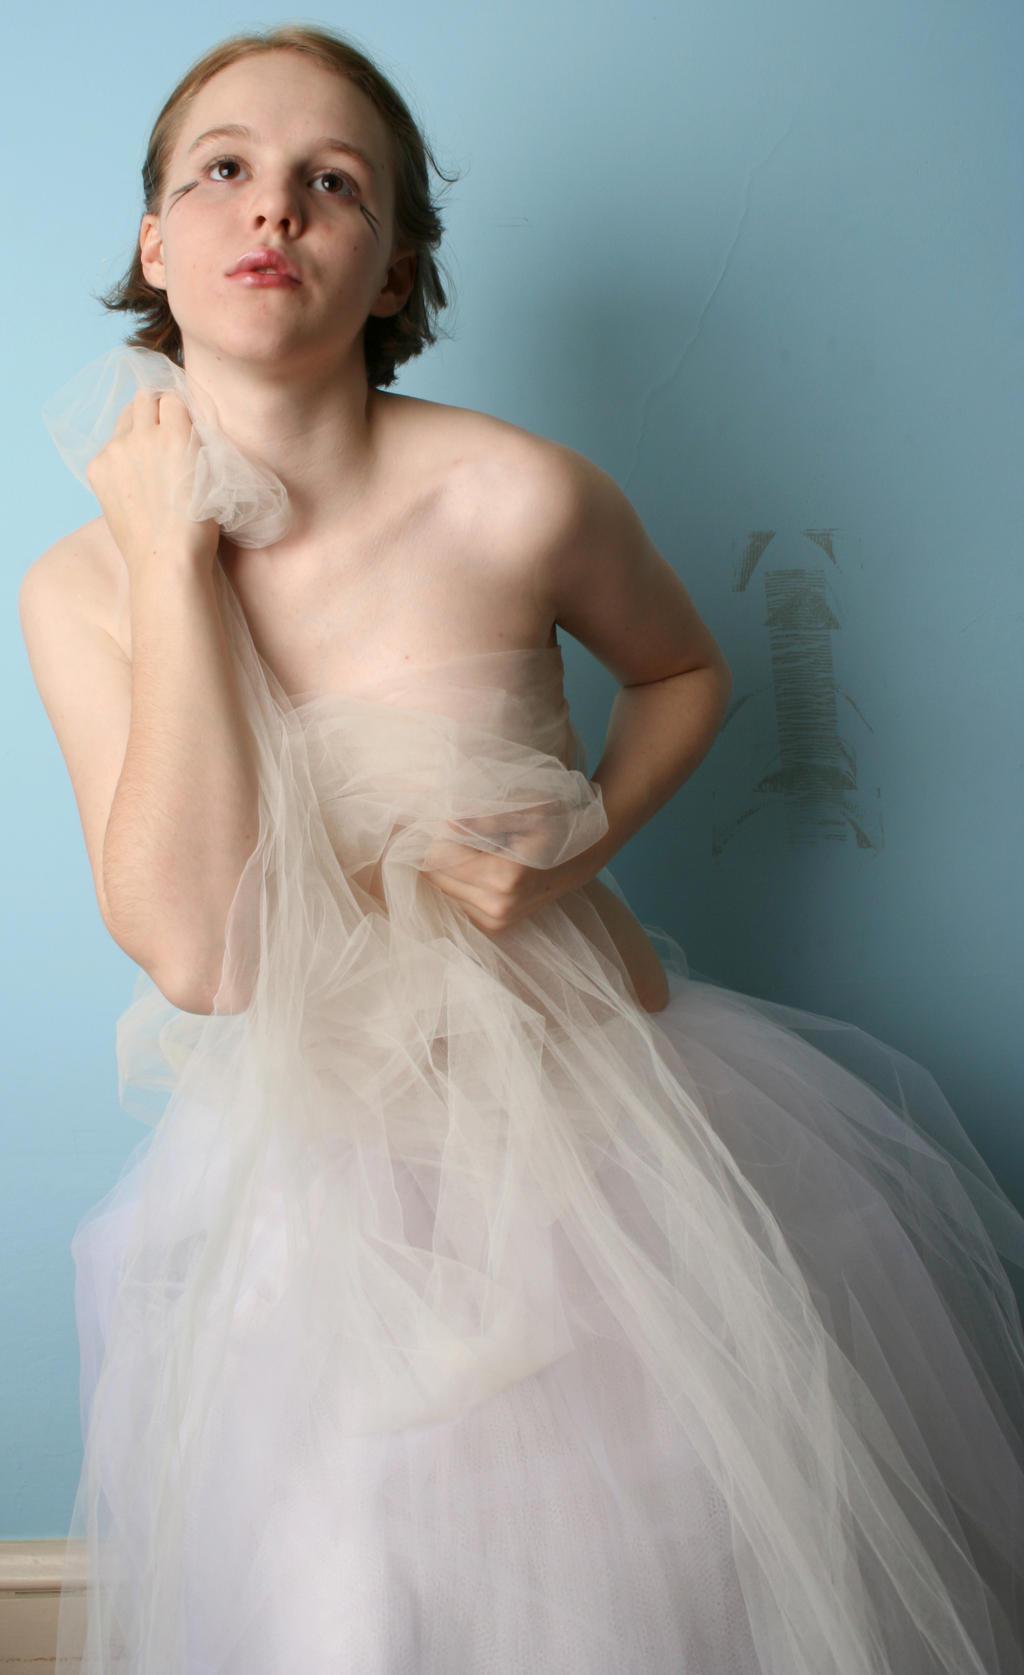 dramatic ballerina by AttempteStock